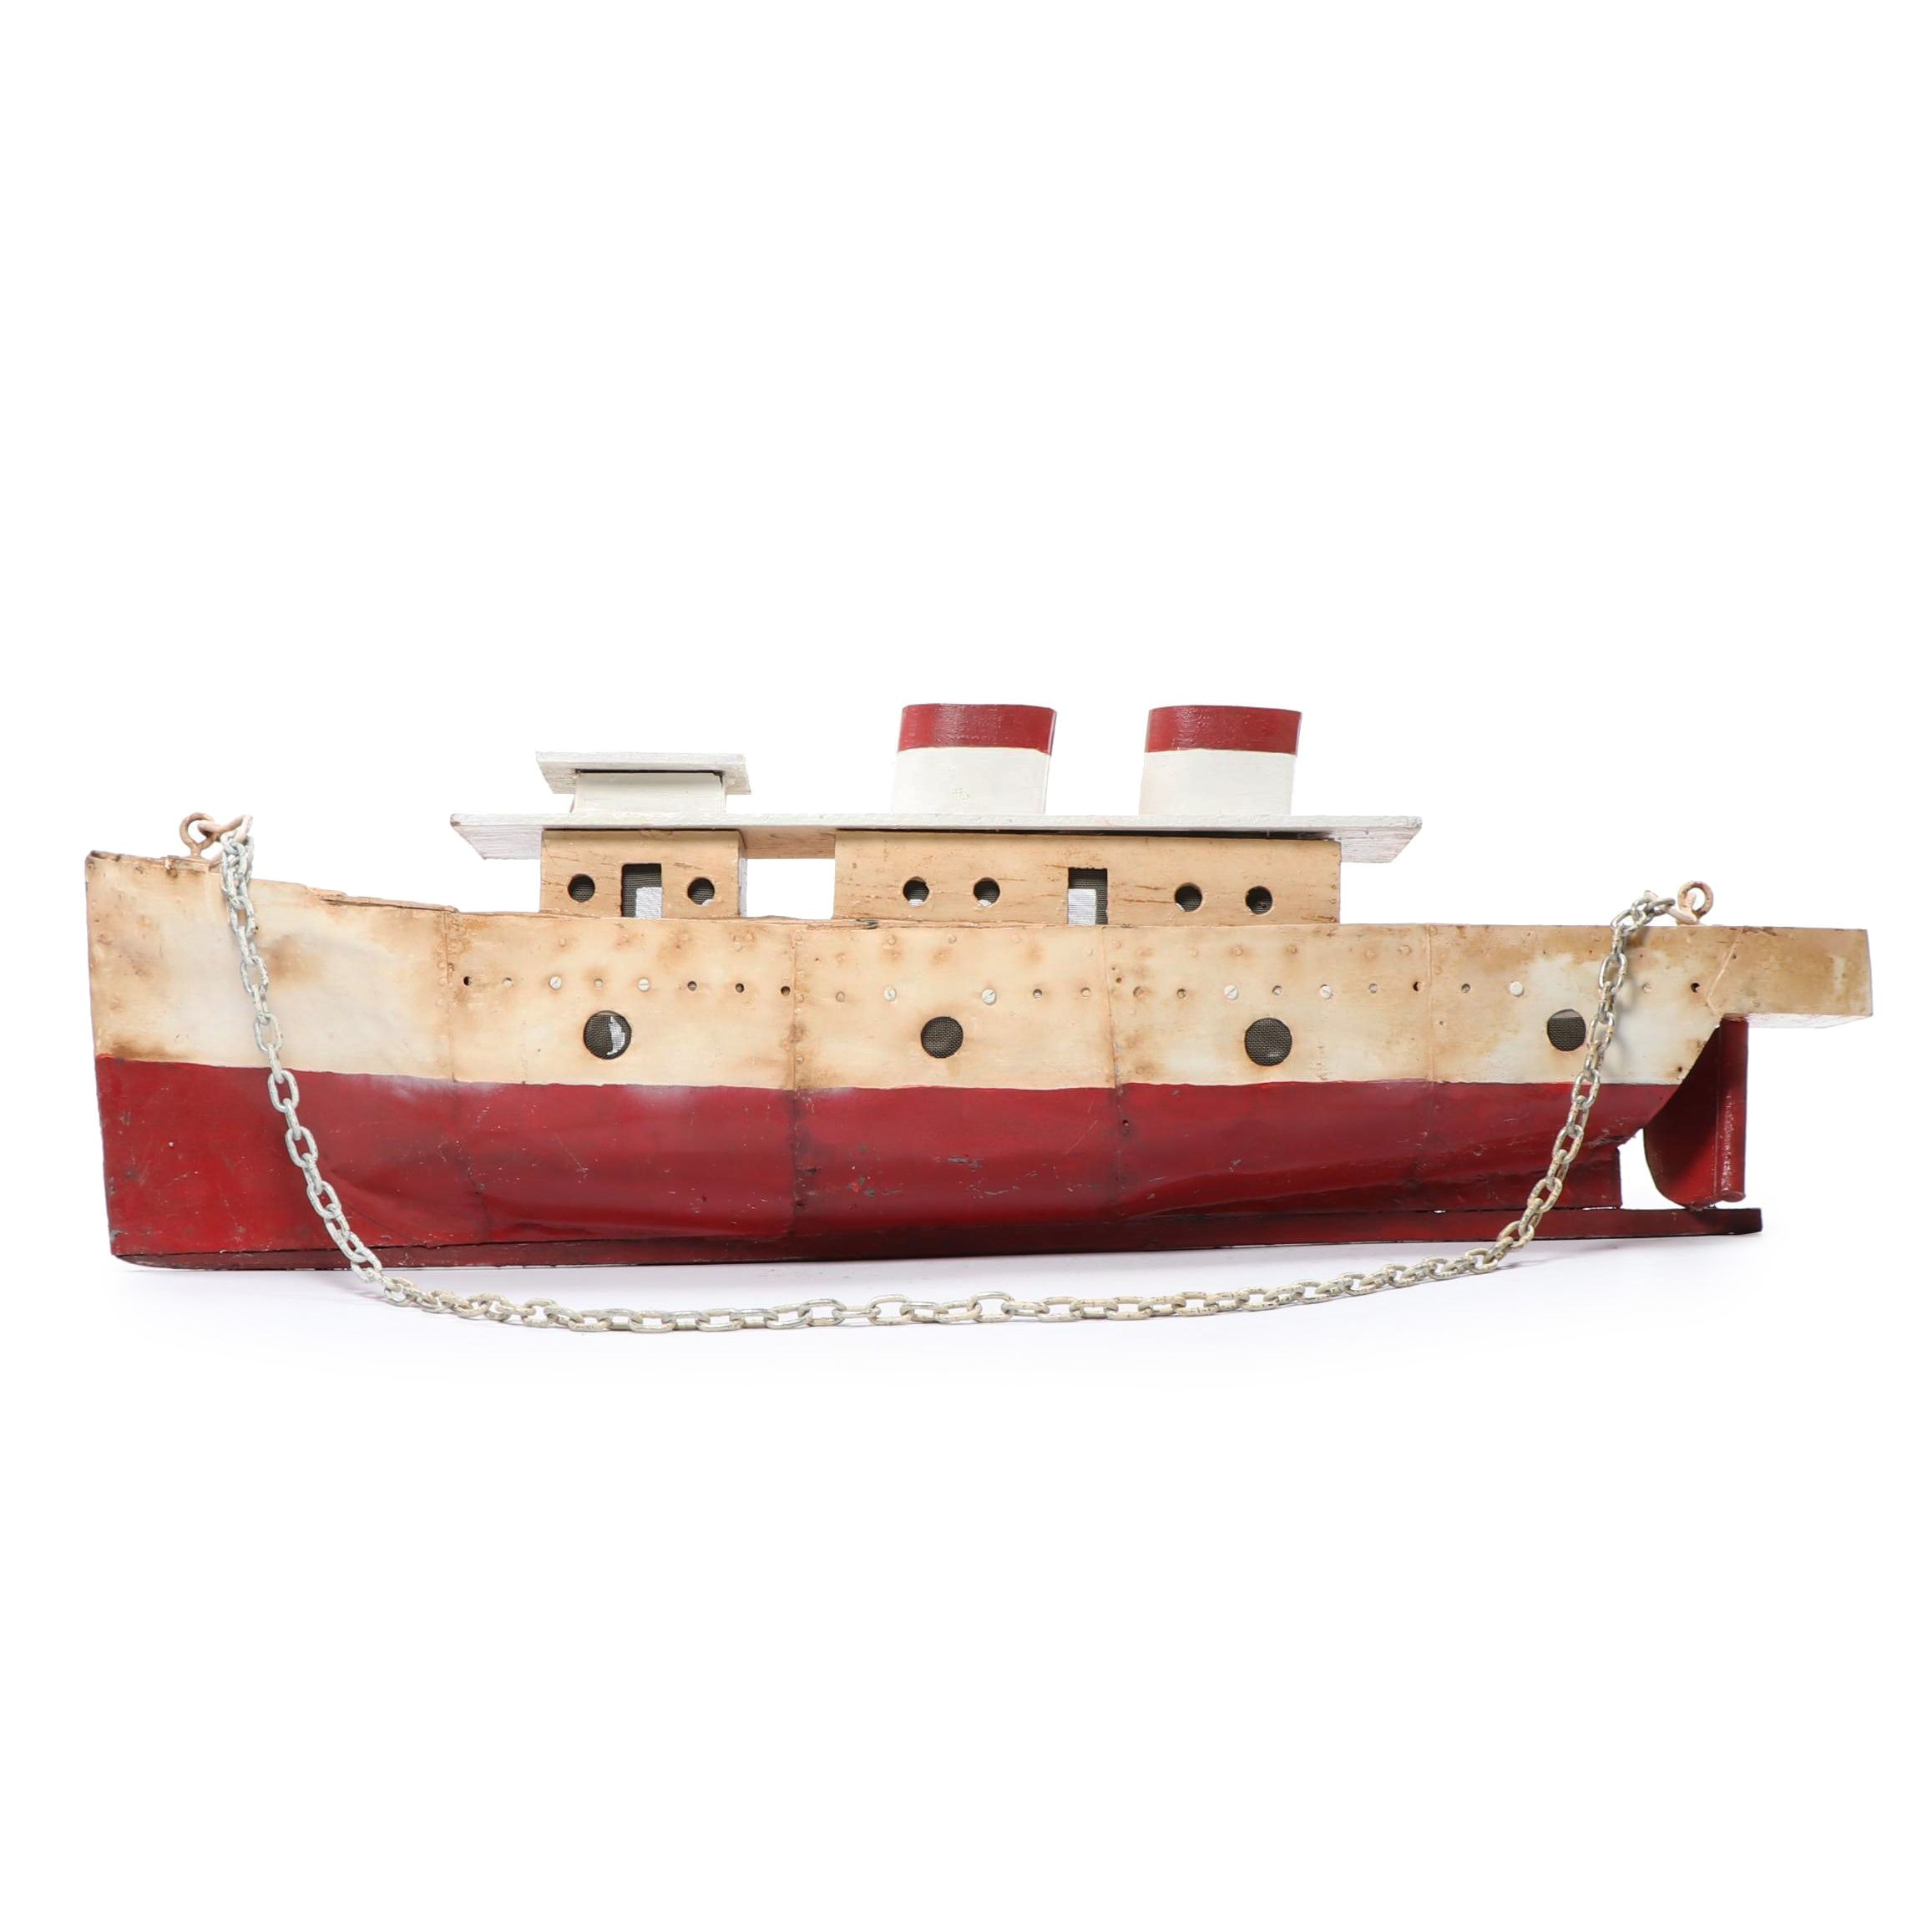 Large Handcrafted Steamship Model